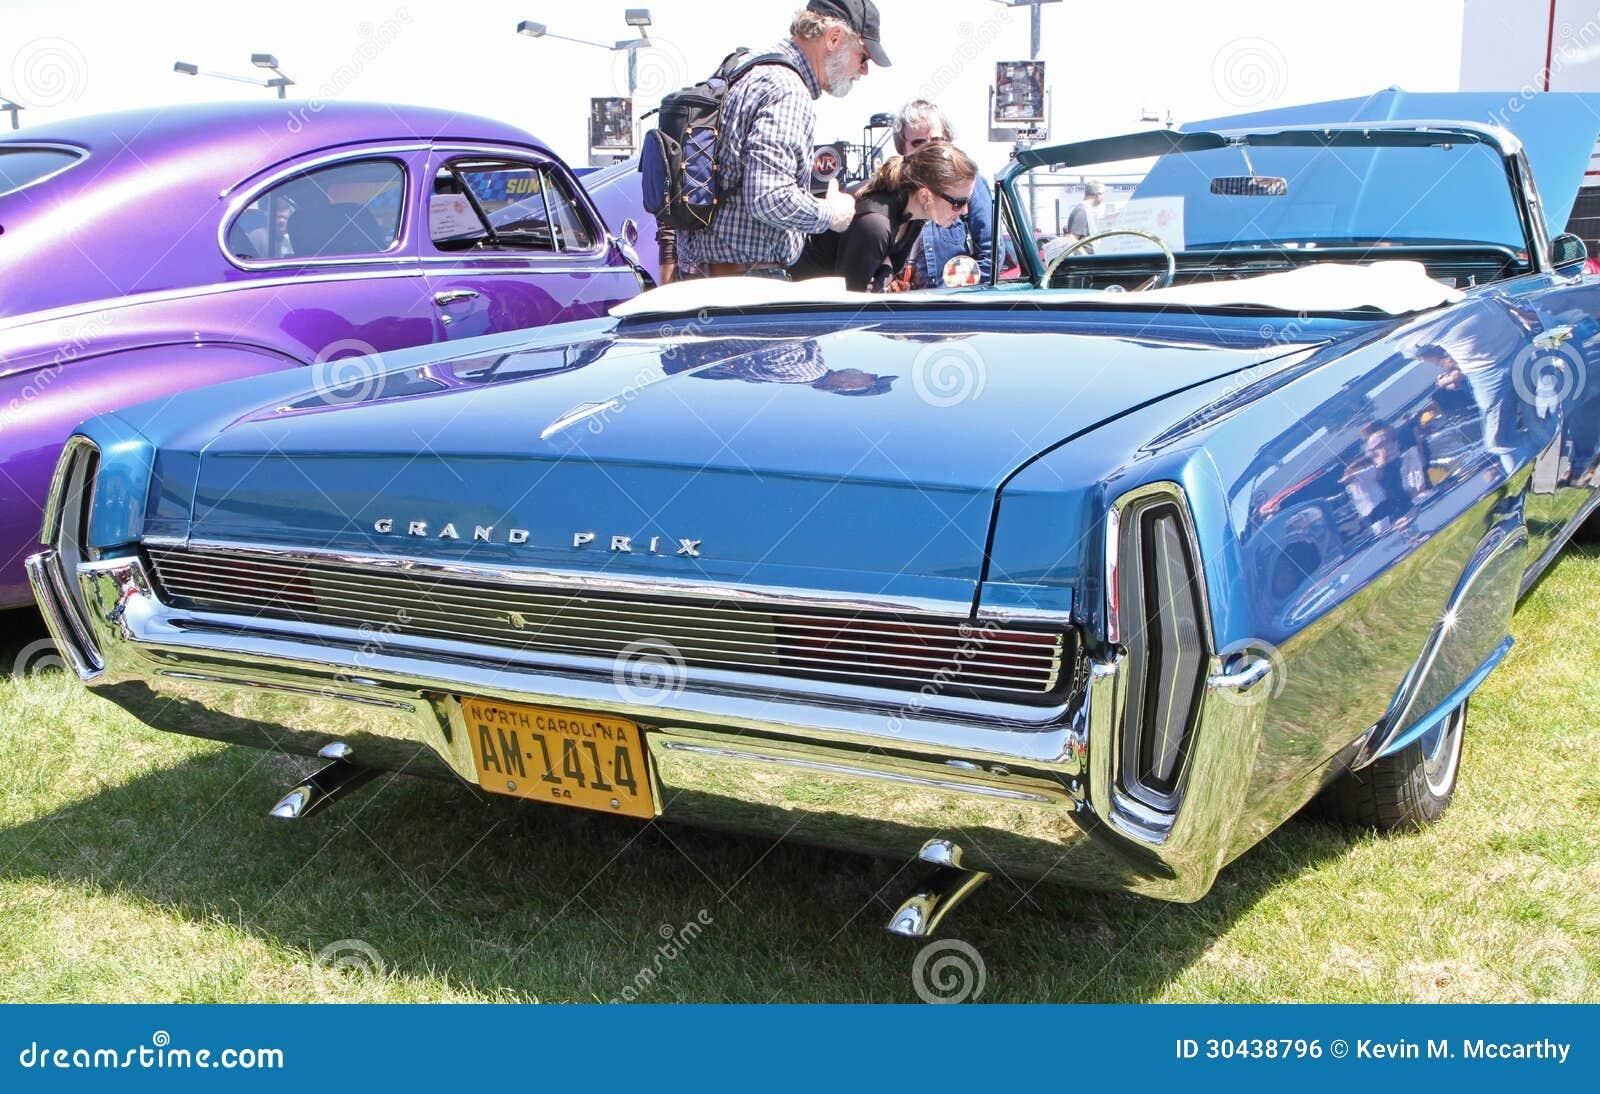 antique pontiac grand prix automobile editorial photo image 30438796. Black Bedroom Furniture Sets. Home Design Ideas